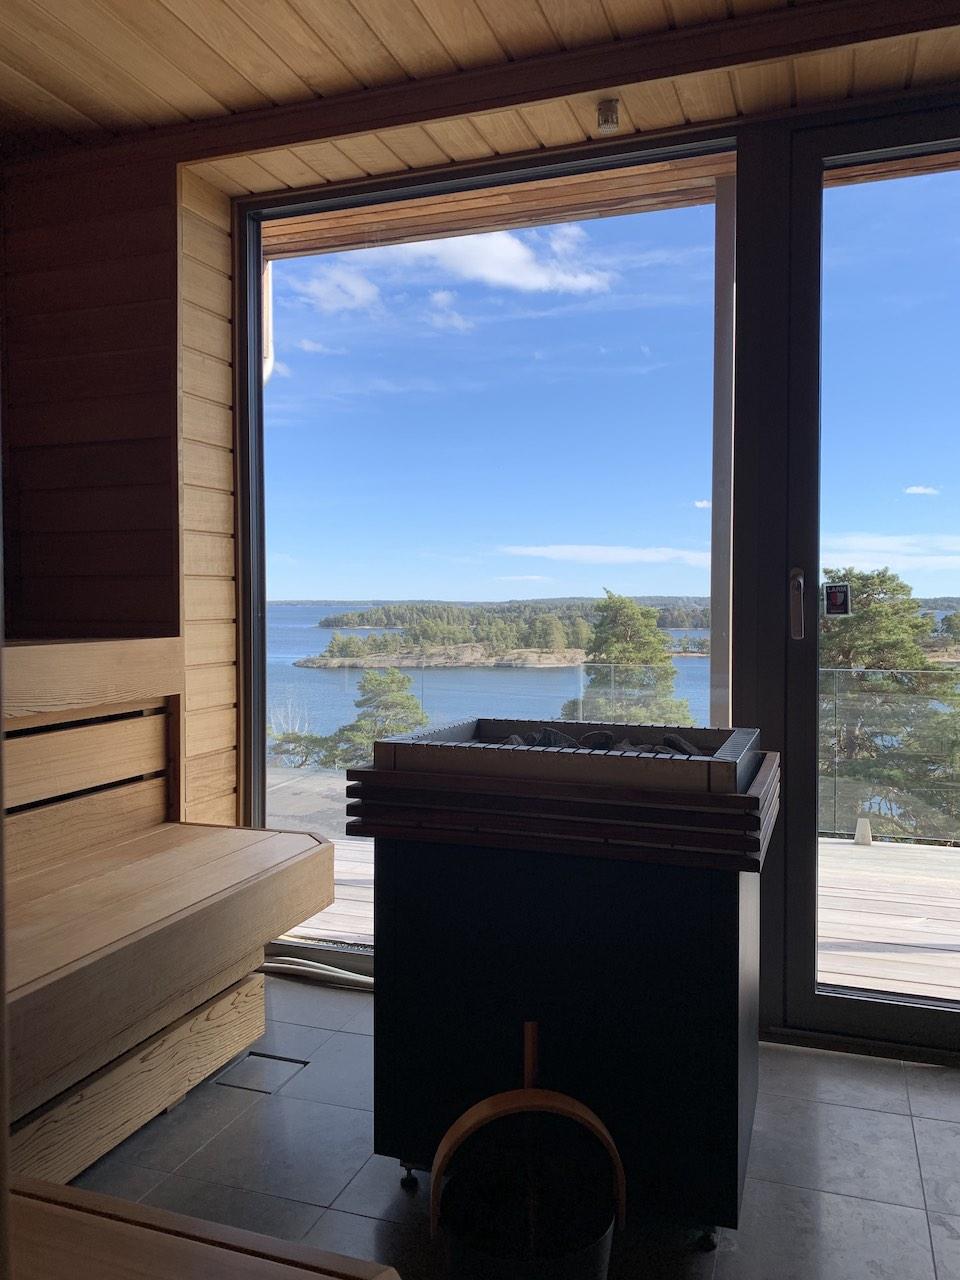 Byggboom i Stockholms Skärgård